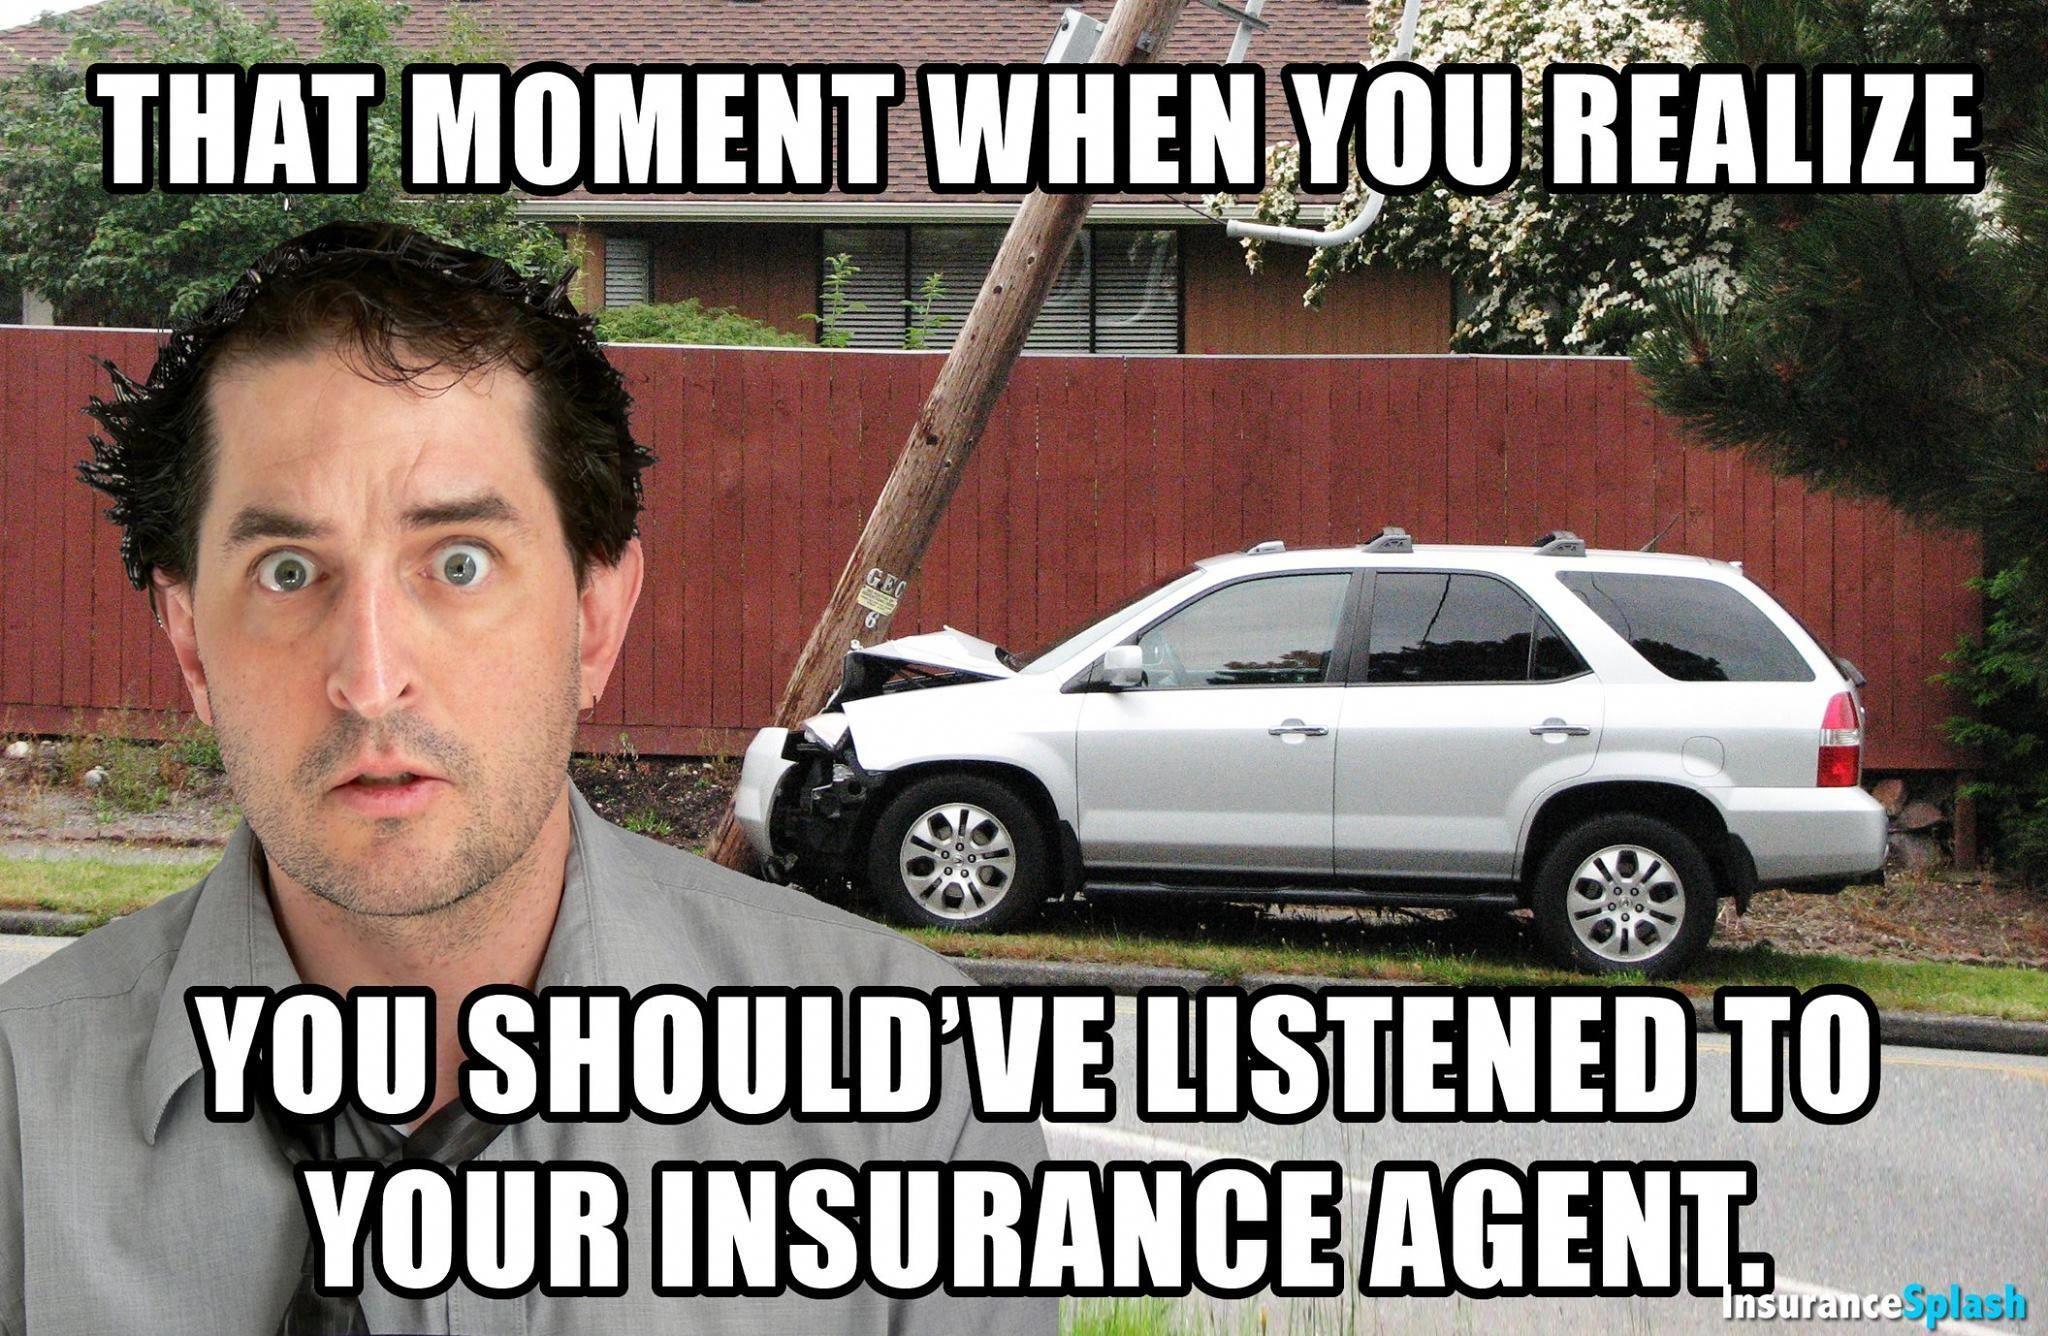 This Happens Way Too Often Lifeinsurancequotes Life Insurance Quotes Insurance Meme Insurance Marketing